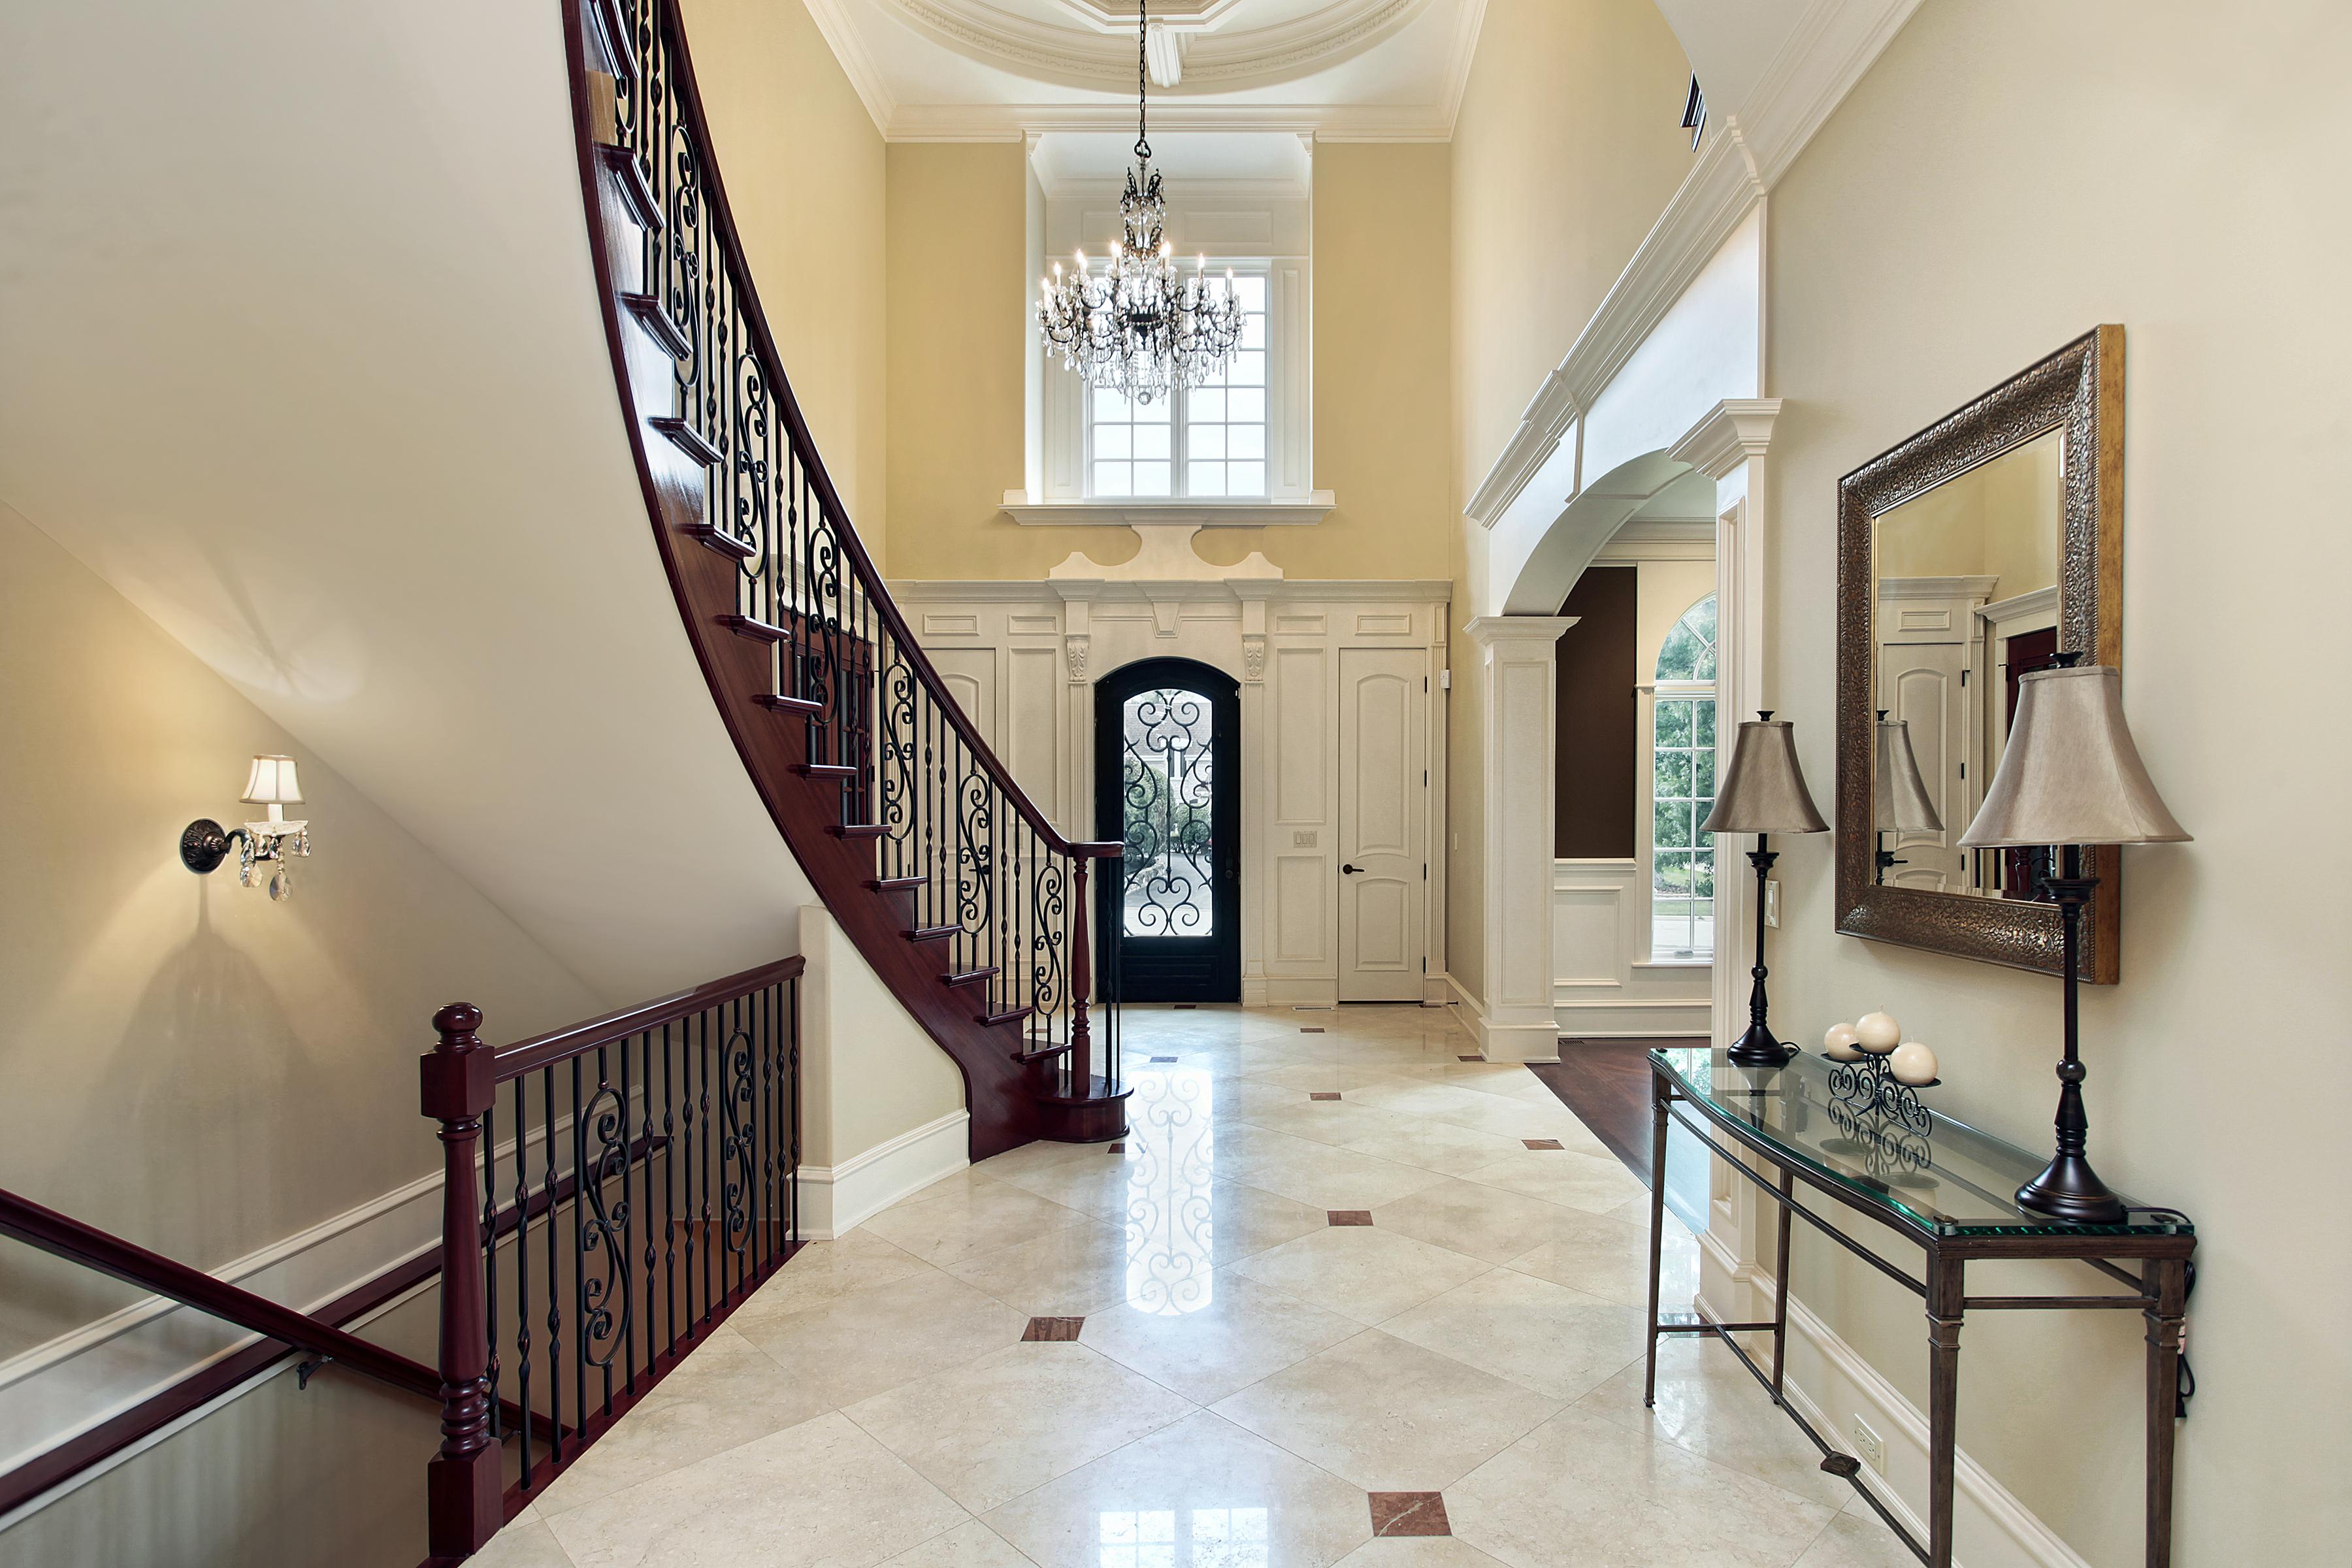 8 Monetary Advantages of Homeownership